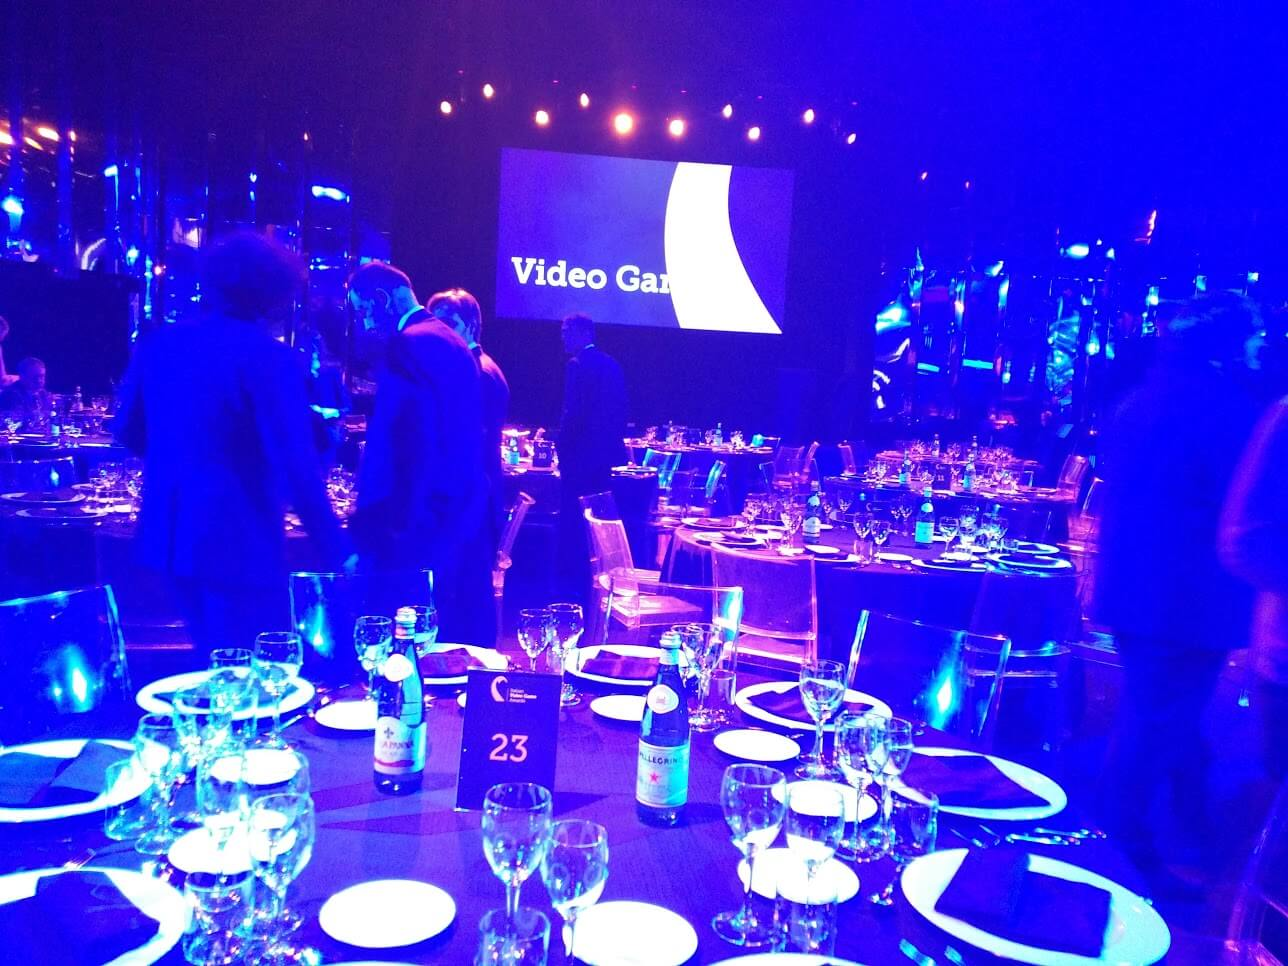 italian videogames awards 2018 vetra